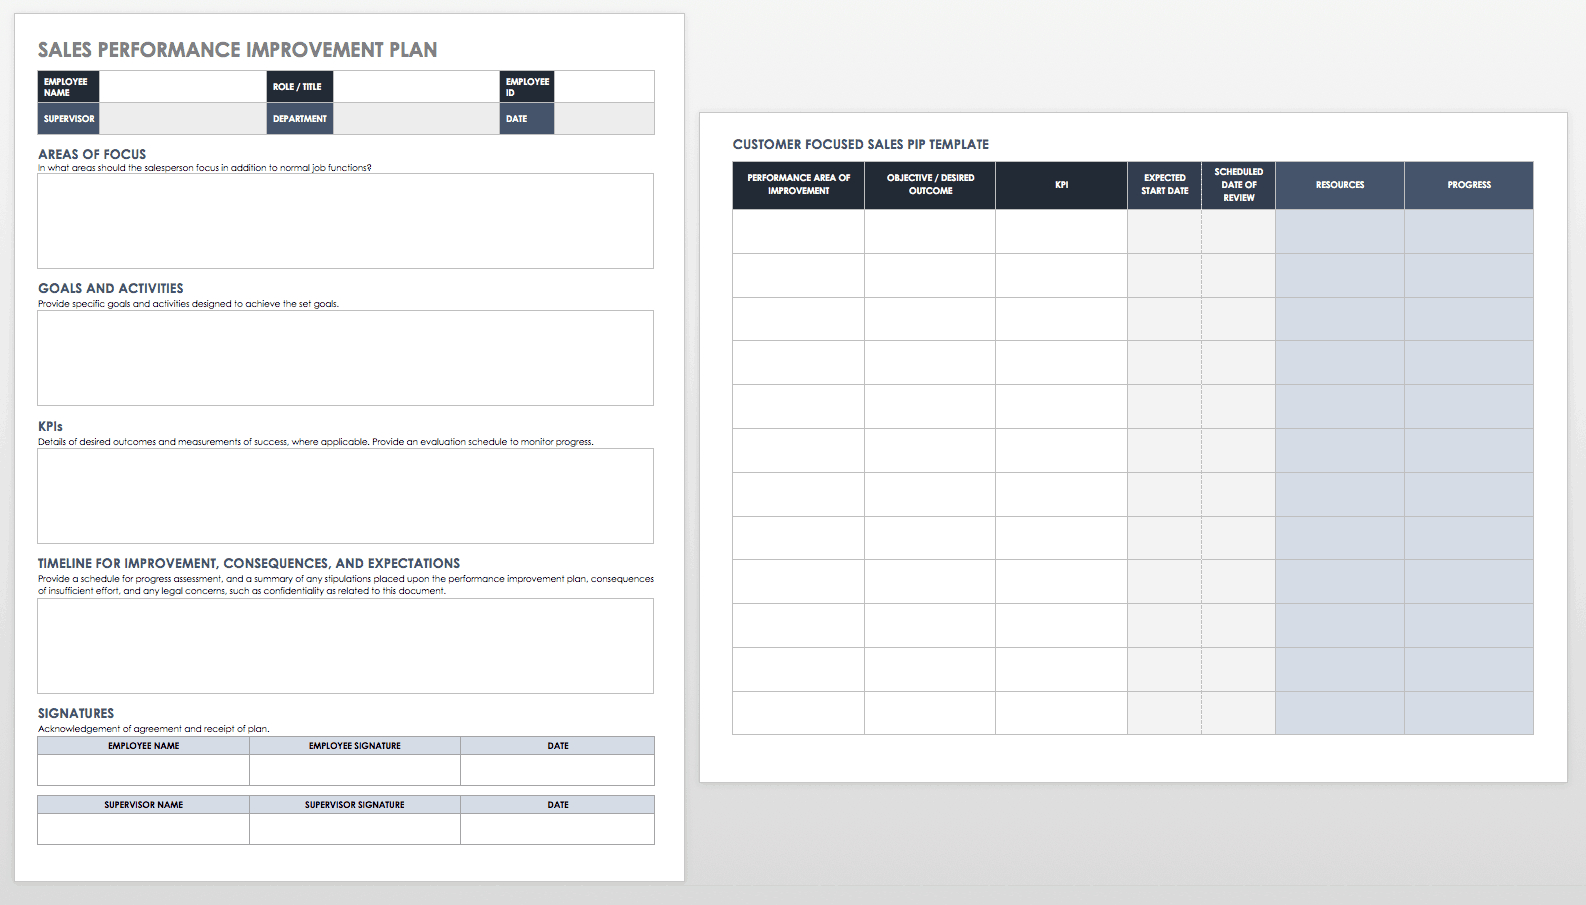 Performance Improvement Plan Templates | Smartsheet Inside Performance Improvement Plan Template Word